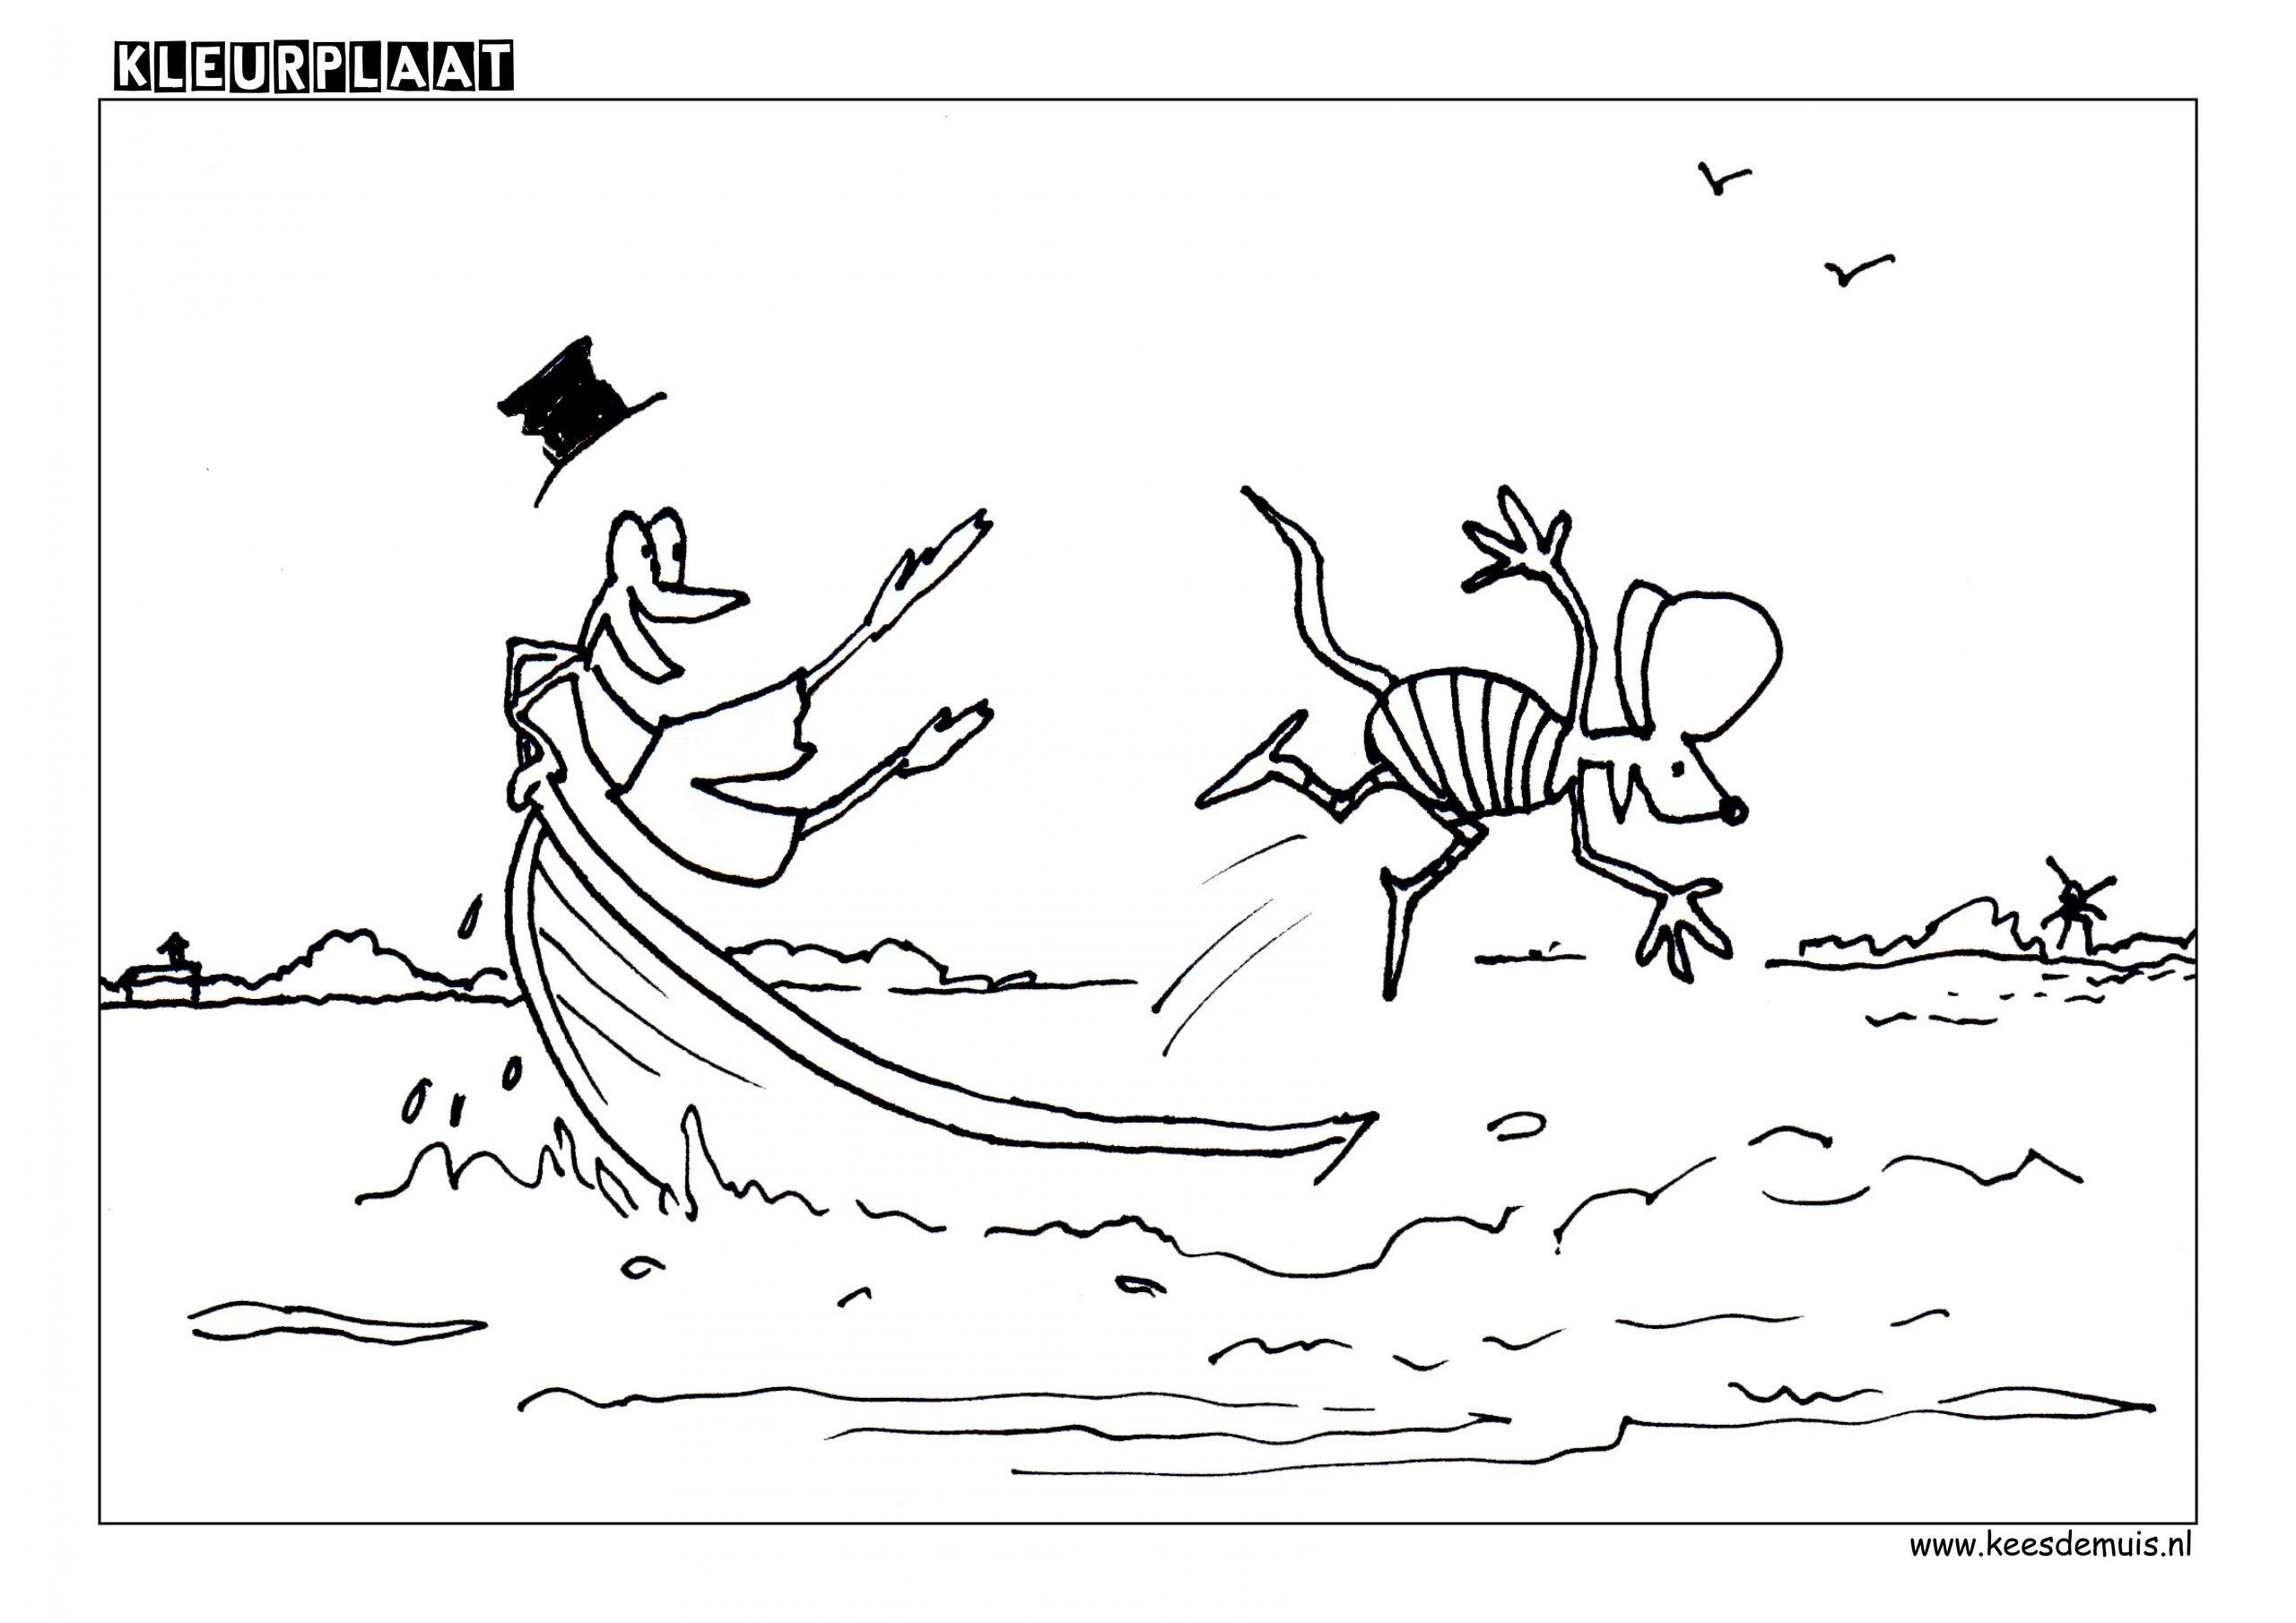 Kleurplaat Kikker muis zwemmen boot | Kees de Muis